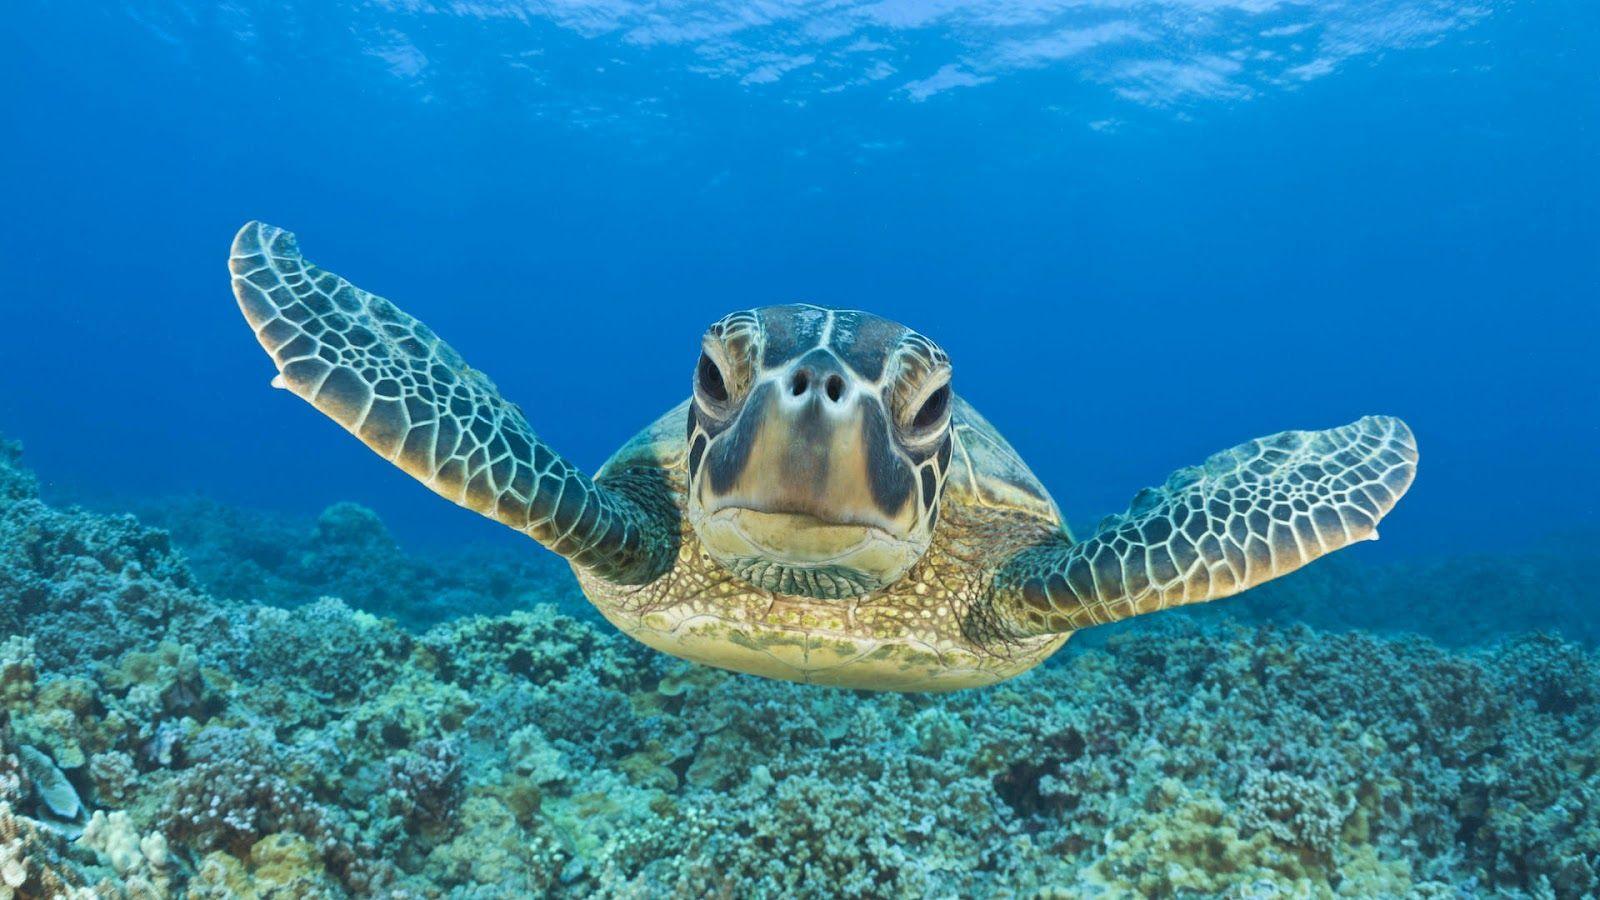 Turtle For Desktop Turtle Wallpaper Sea Turtle Wallpaper World Turtle Day